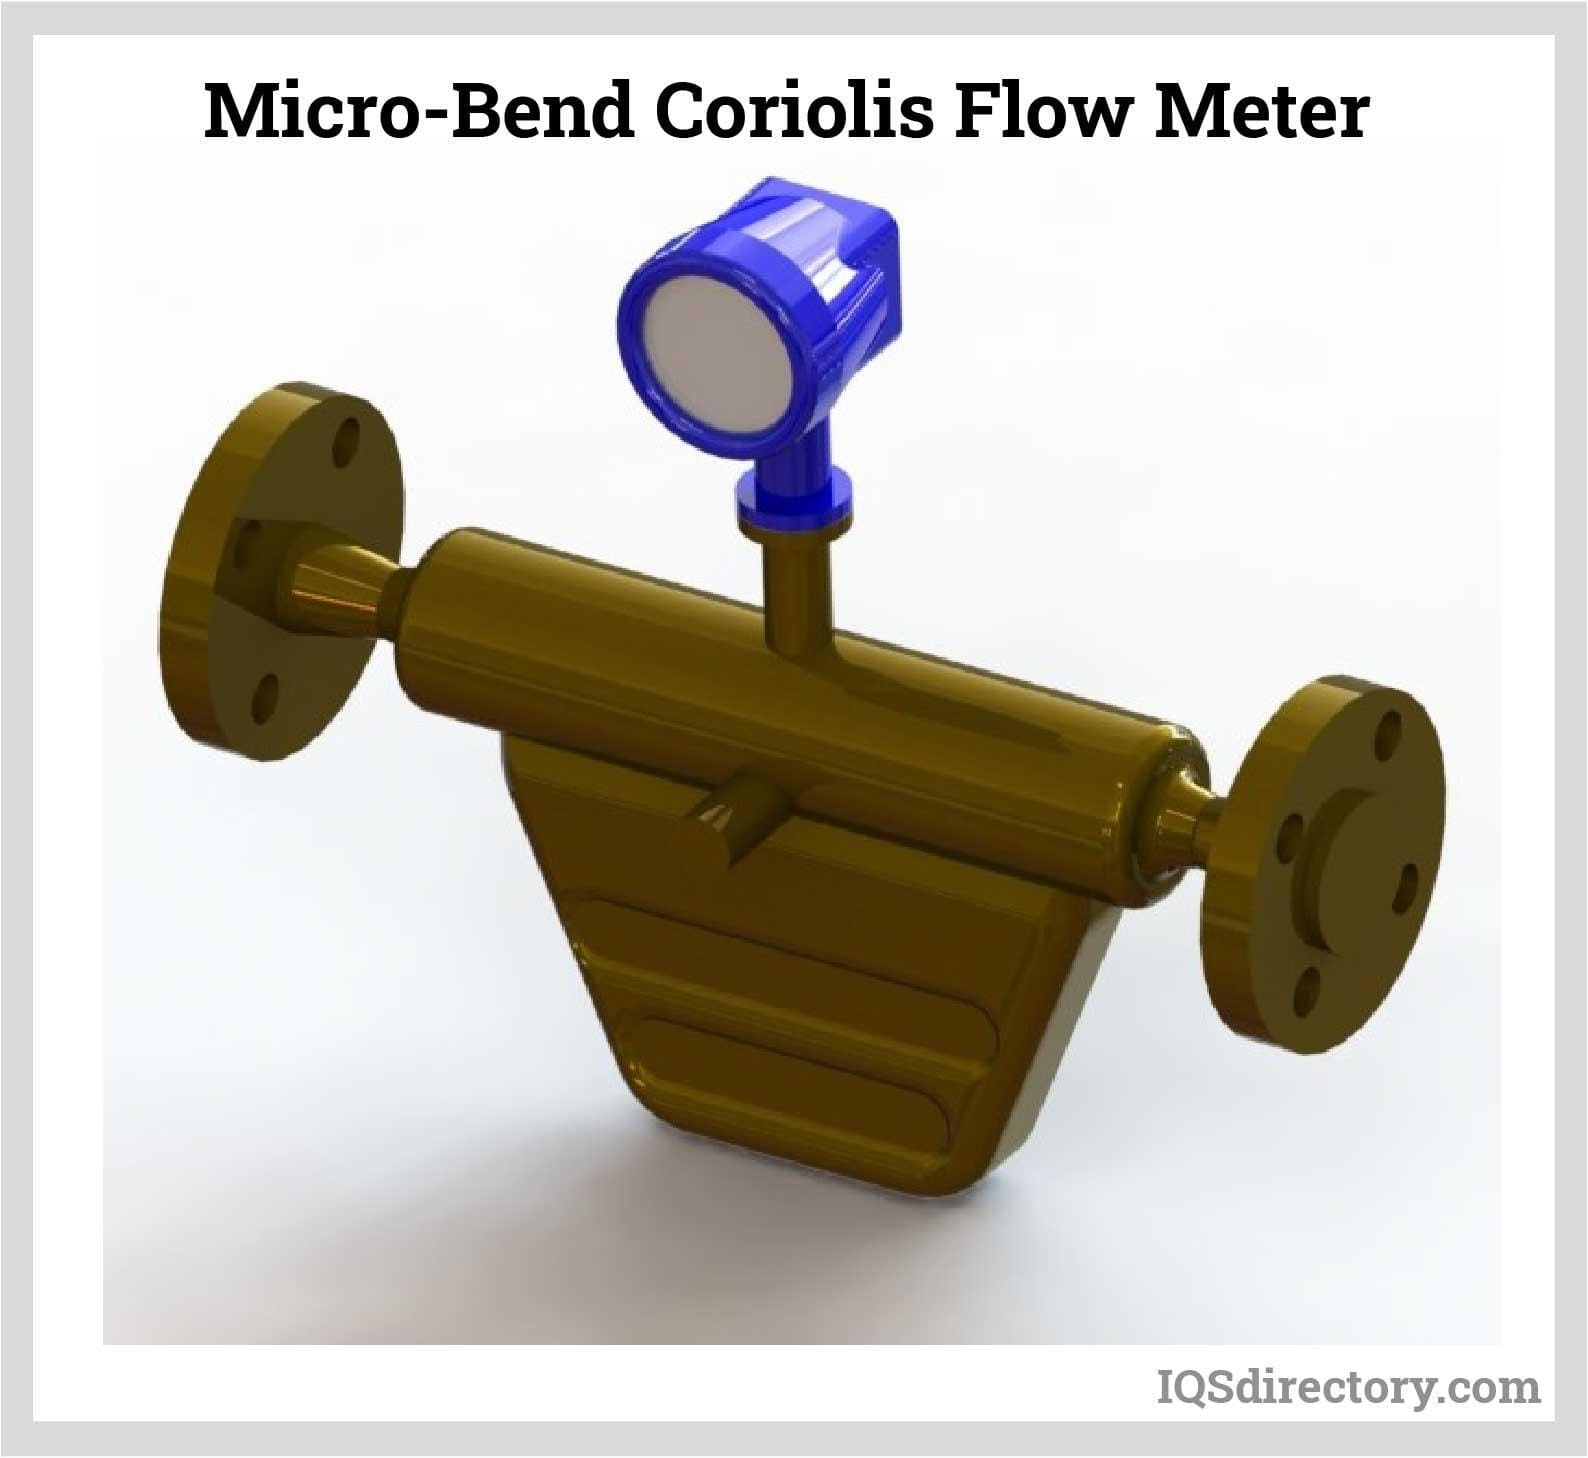 Micro-Bend Coriolis Flow Meter